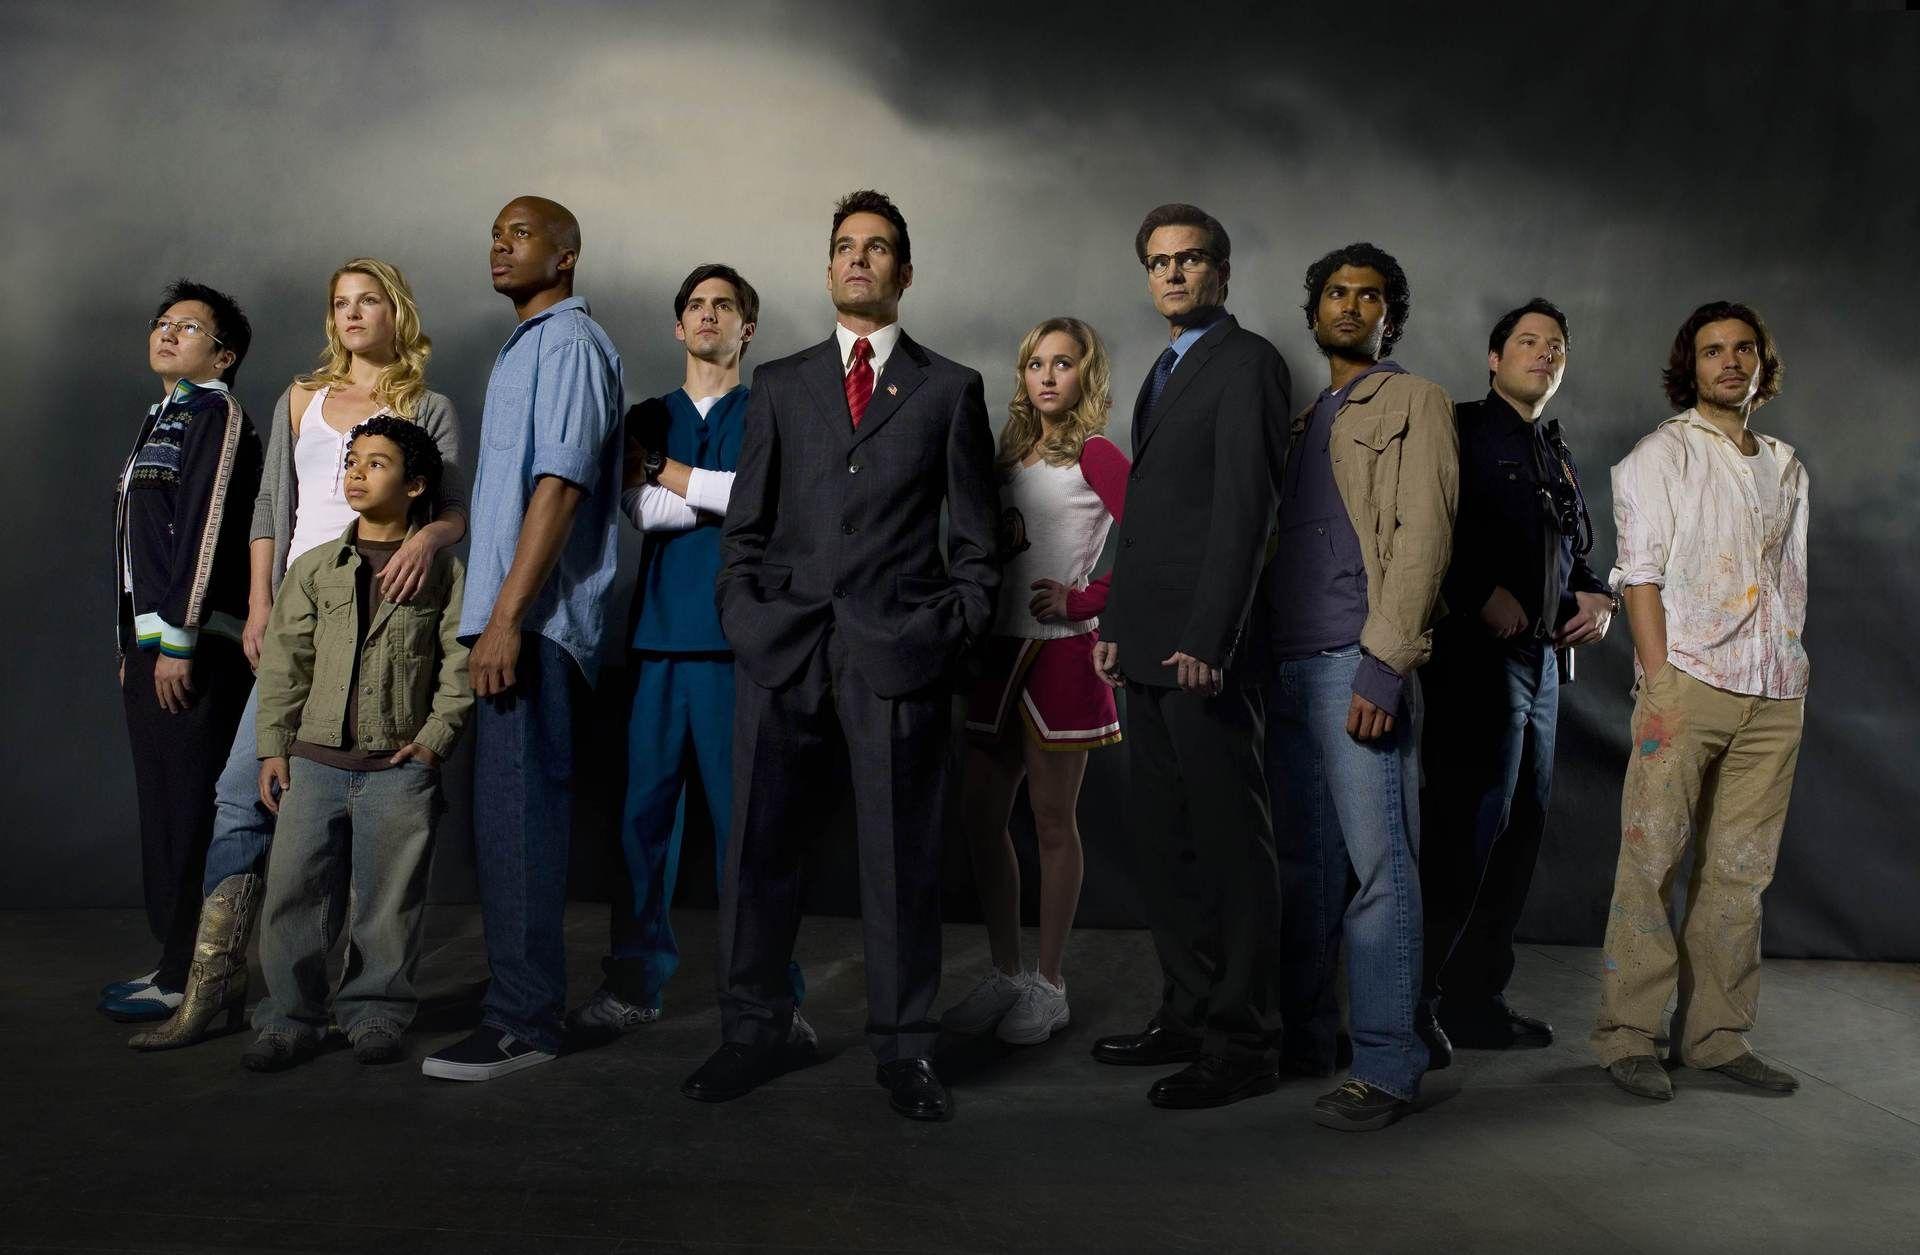 Heroes-Season-1-Cast